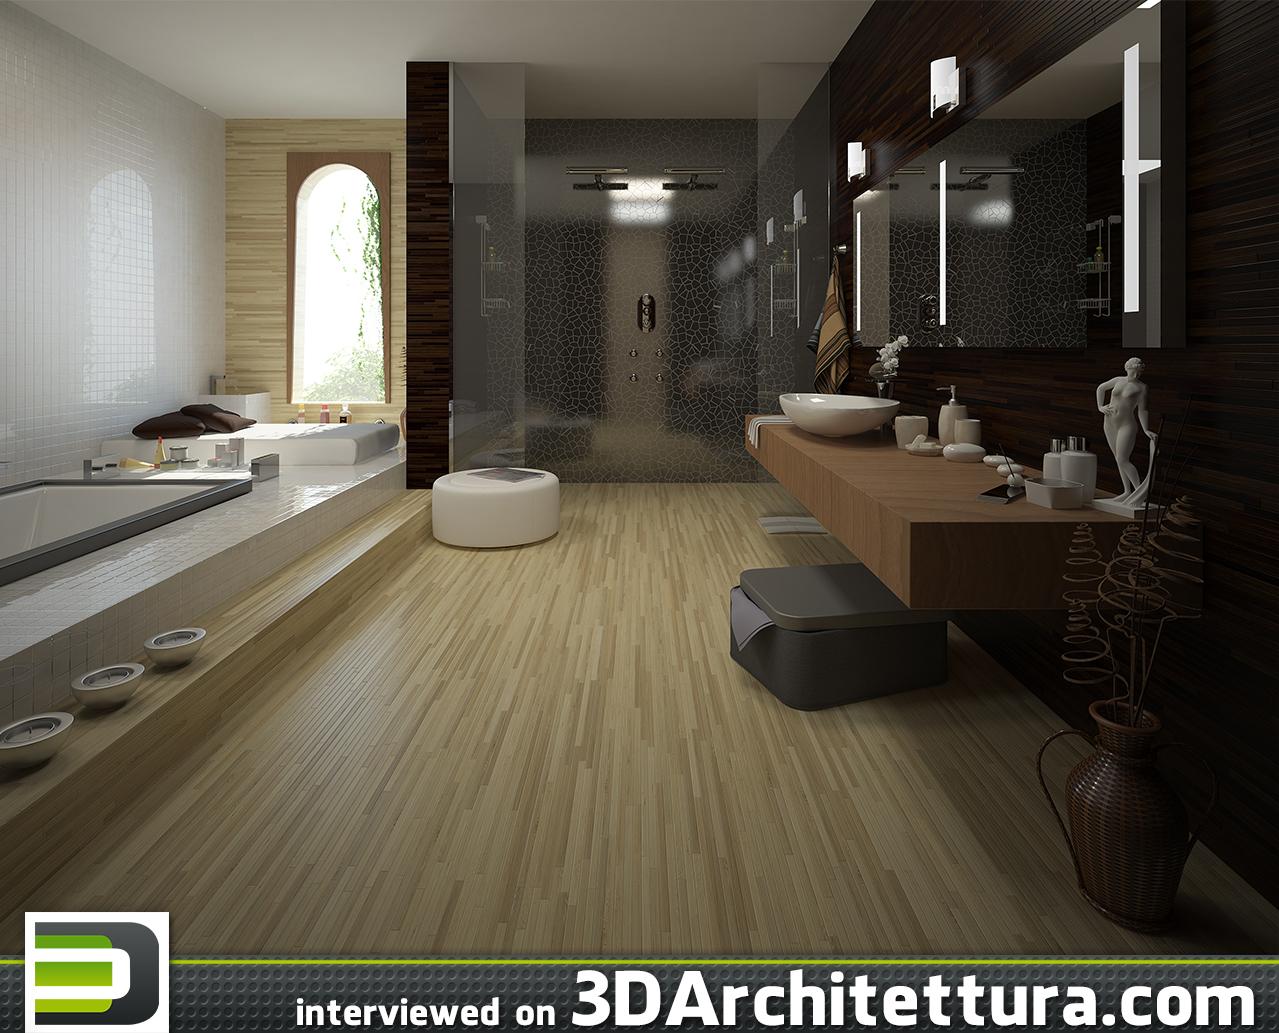 Alessandro Berti interviewed on 3D Architettura: render, 3d, design, architecture, CG